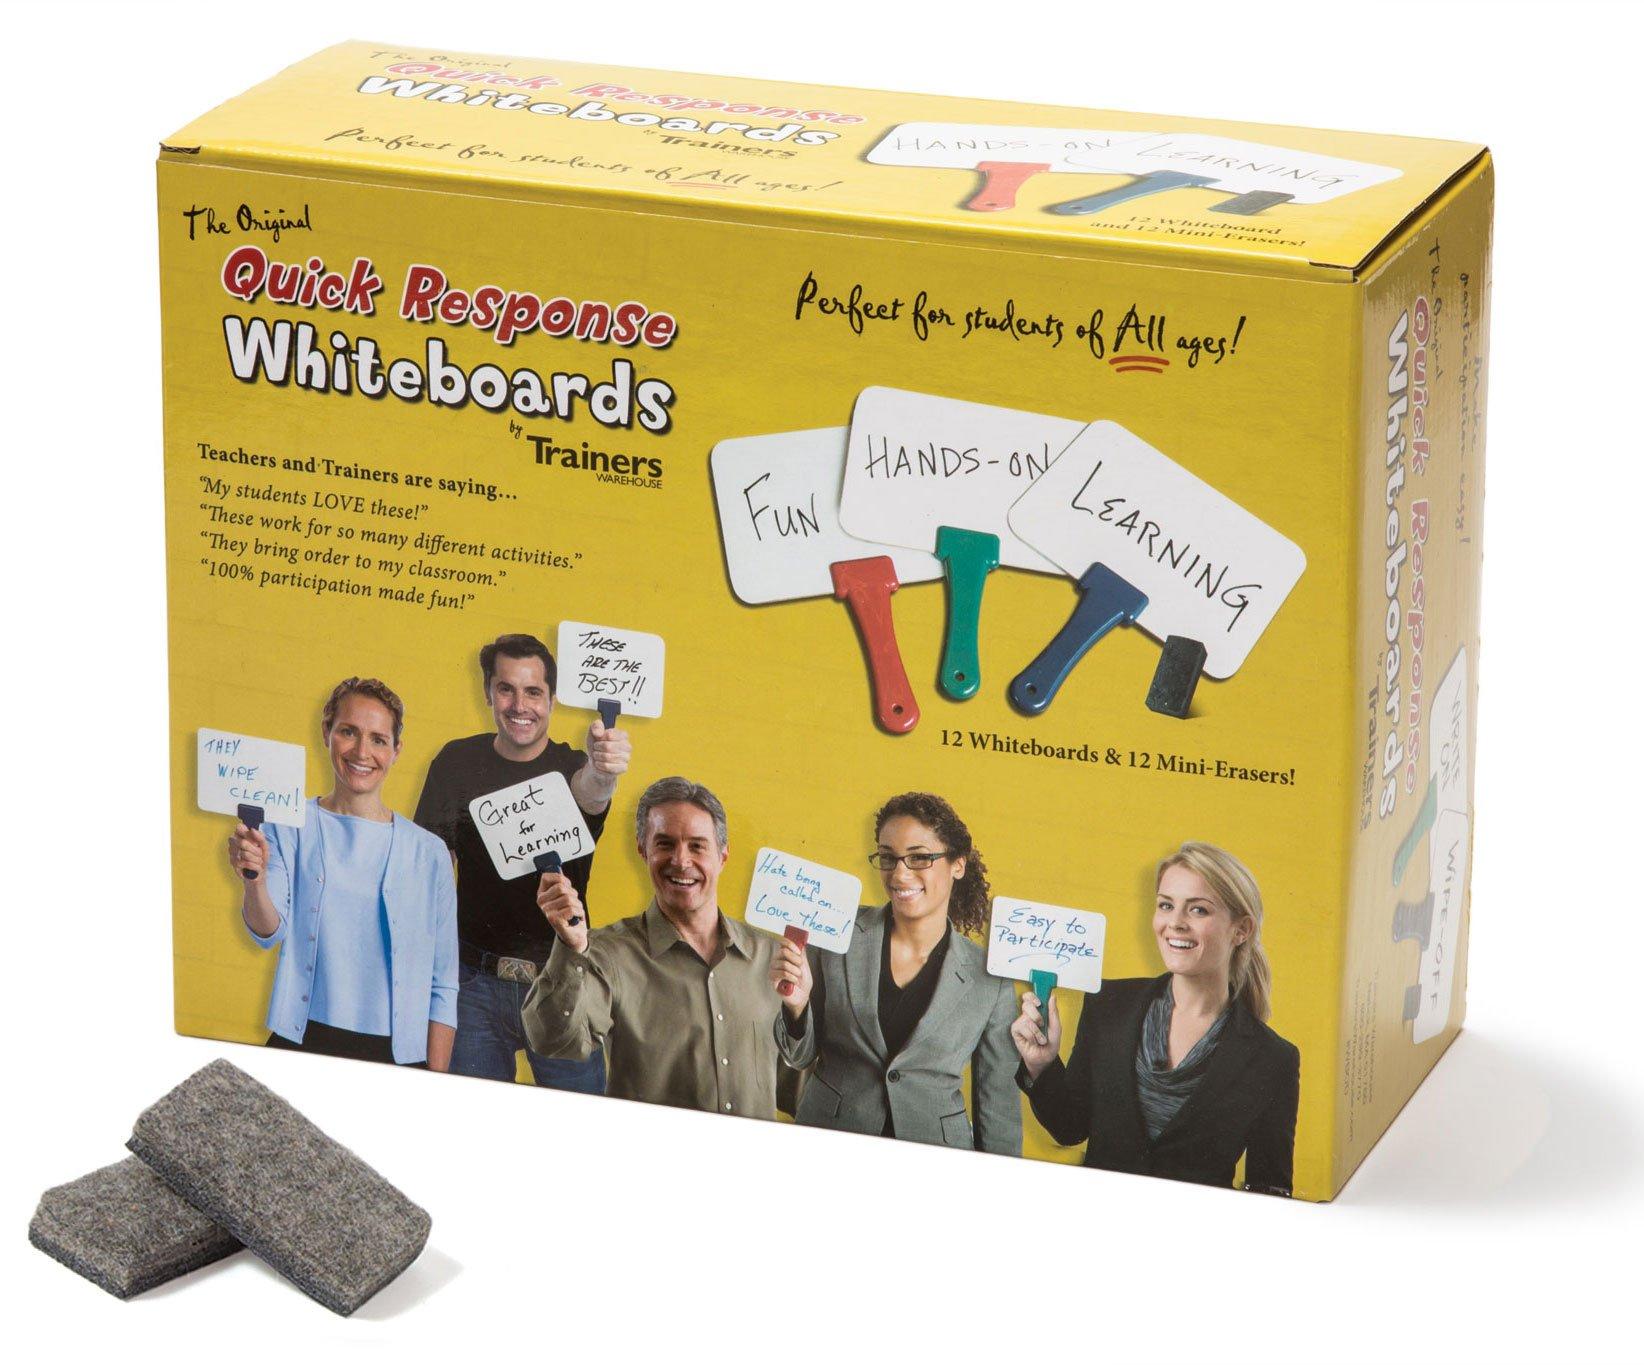 Set of 12 Quick Response Whiteboards w/ Mini Erasers - Classroom Dry Erase Board